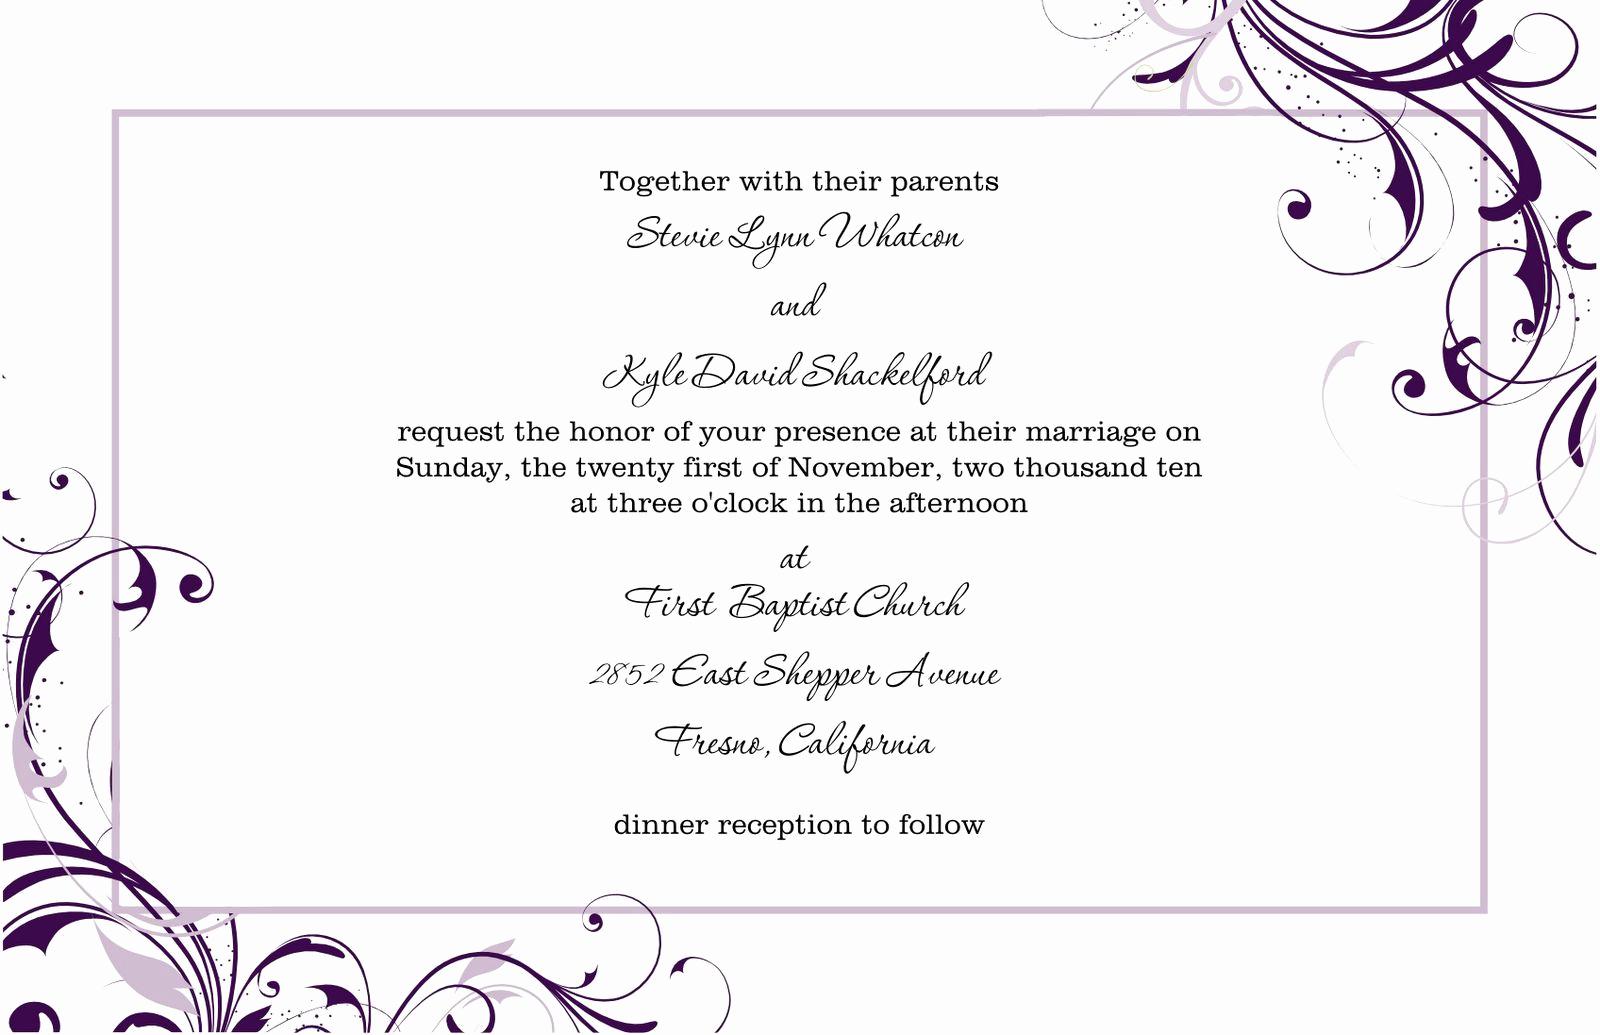 Free Wedding Invitation Templates Download Lovely Free Blank Wedding Invitation Templates for Microsoft Word